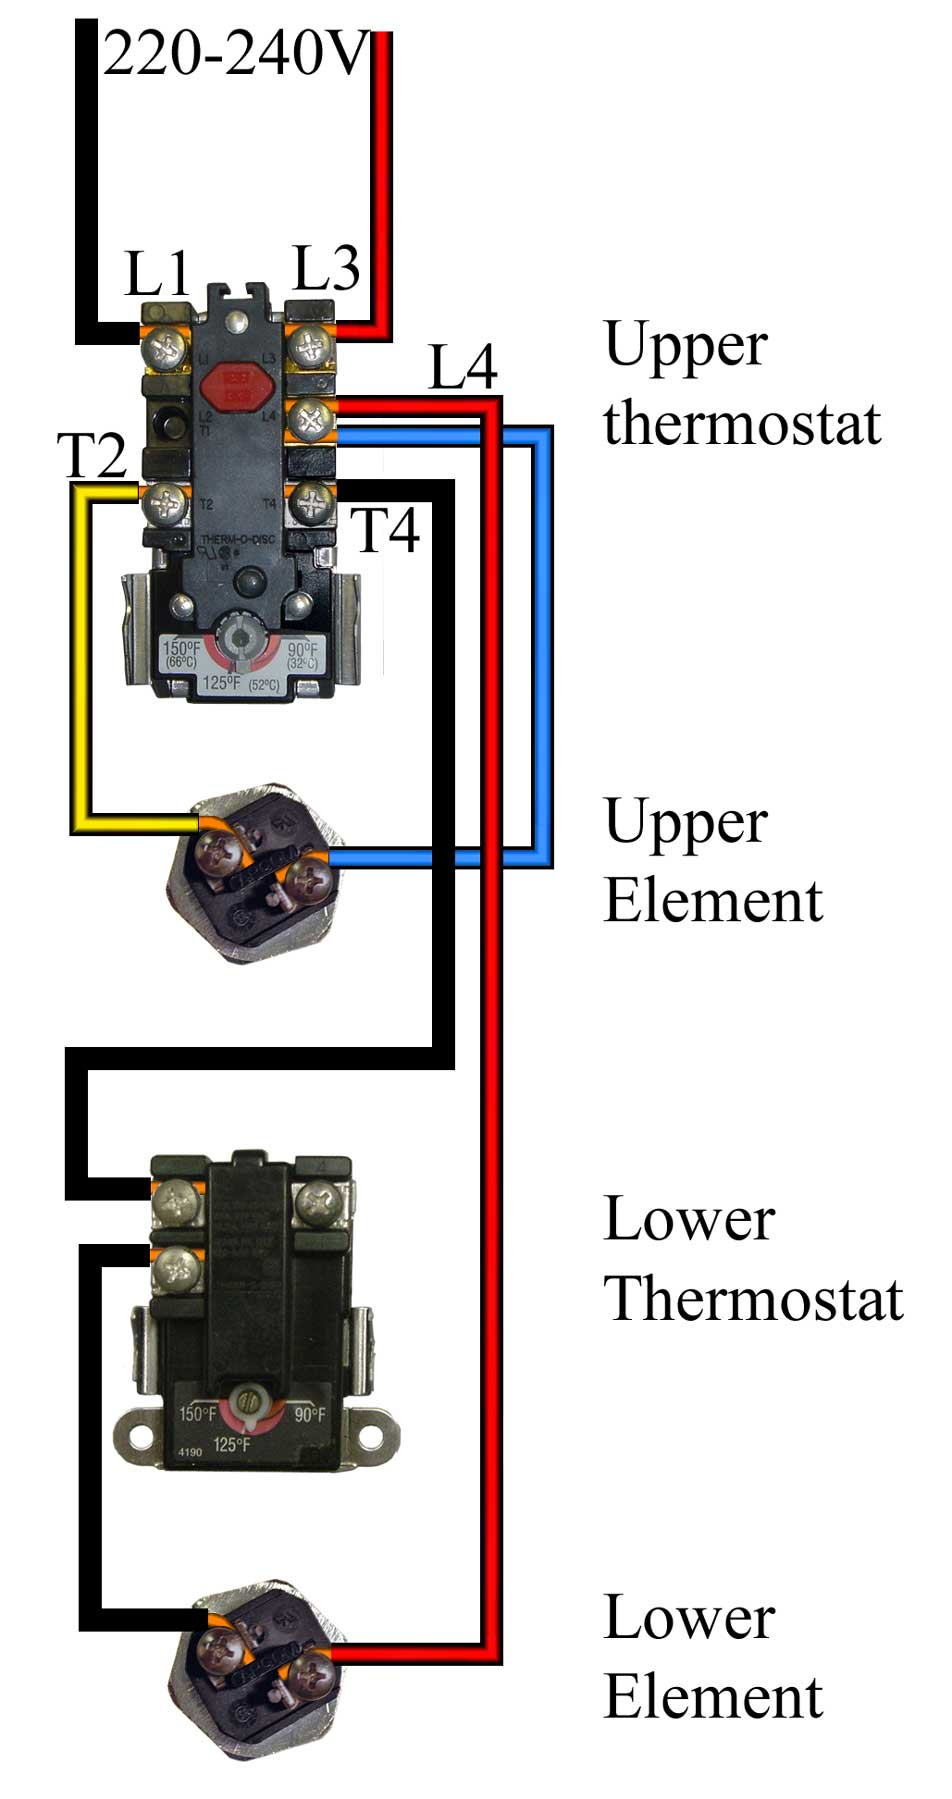 Wiring 240V Water Heater Element - Great Engine Wiring Diagram - 240V Water Heater Wiring Diagram